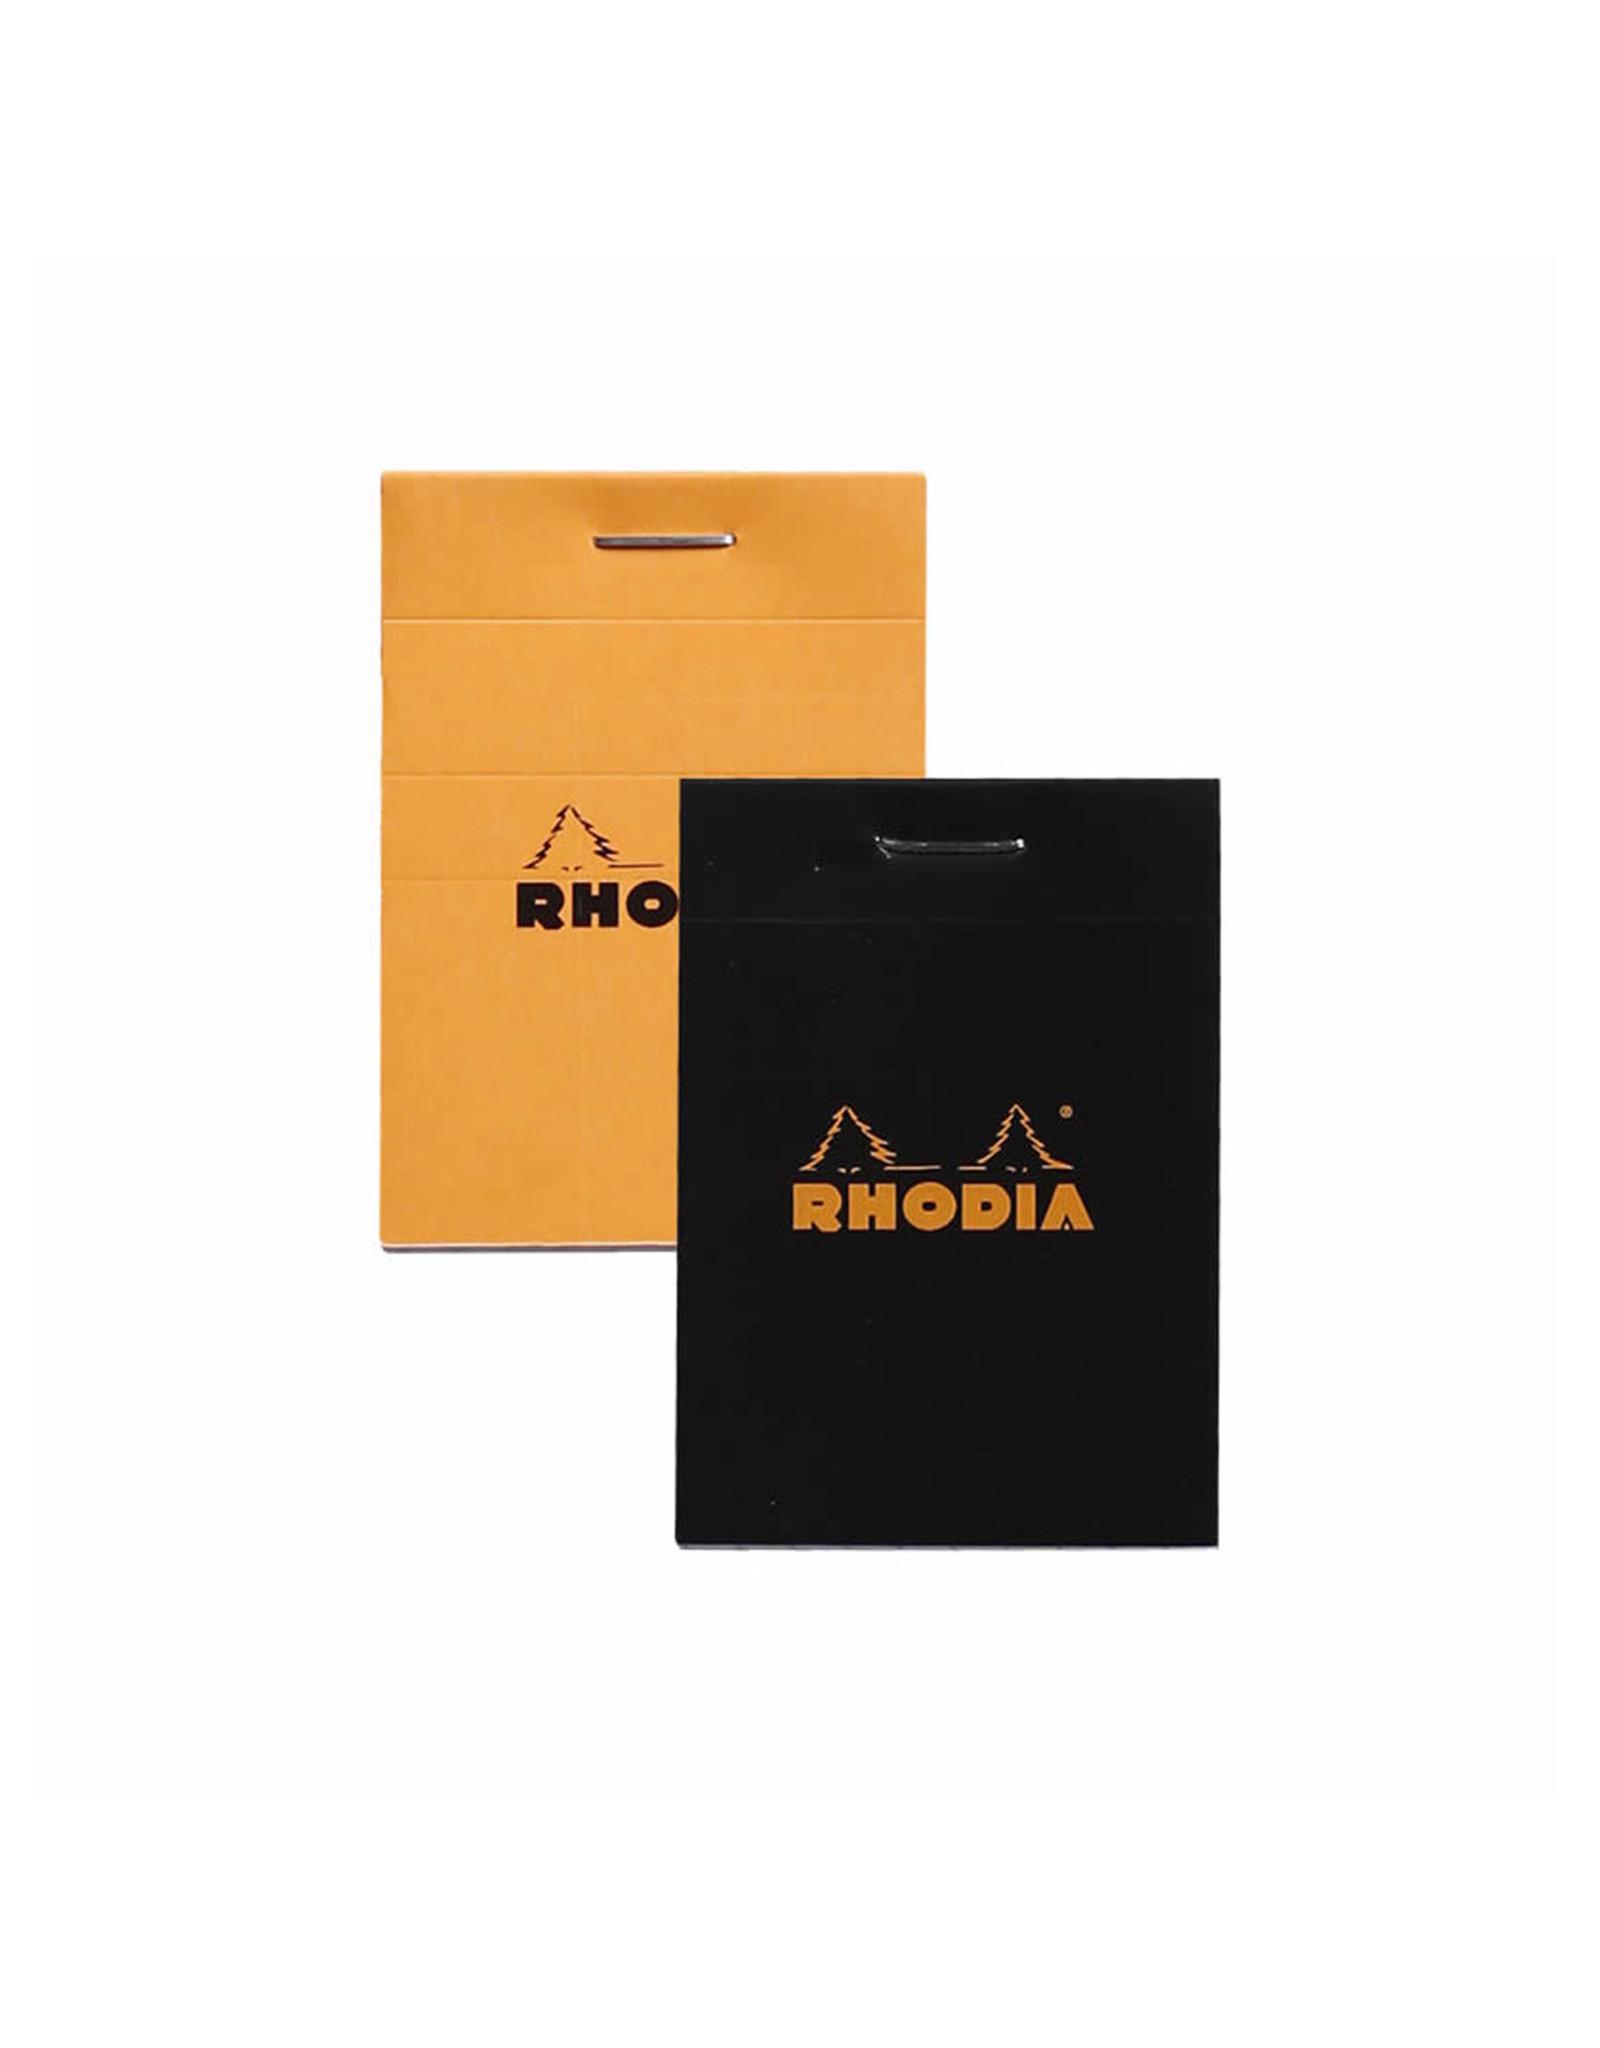 Rhodia Pad No. 10, Black Lined